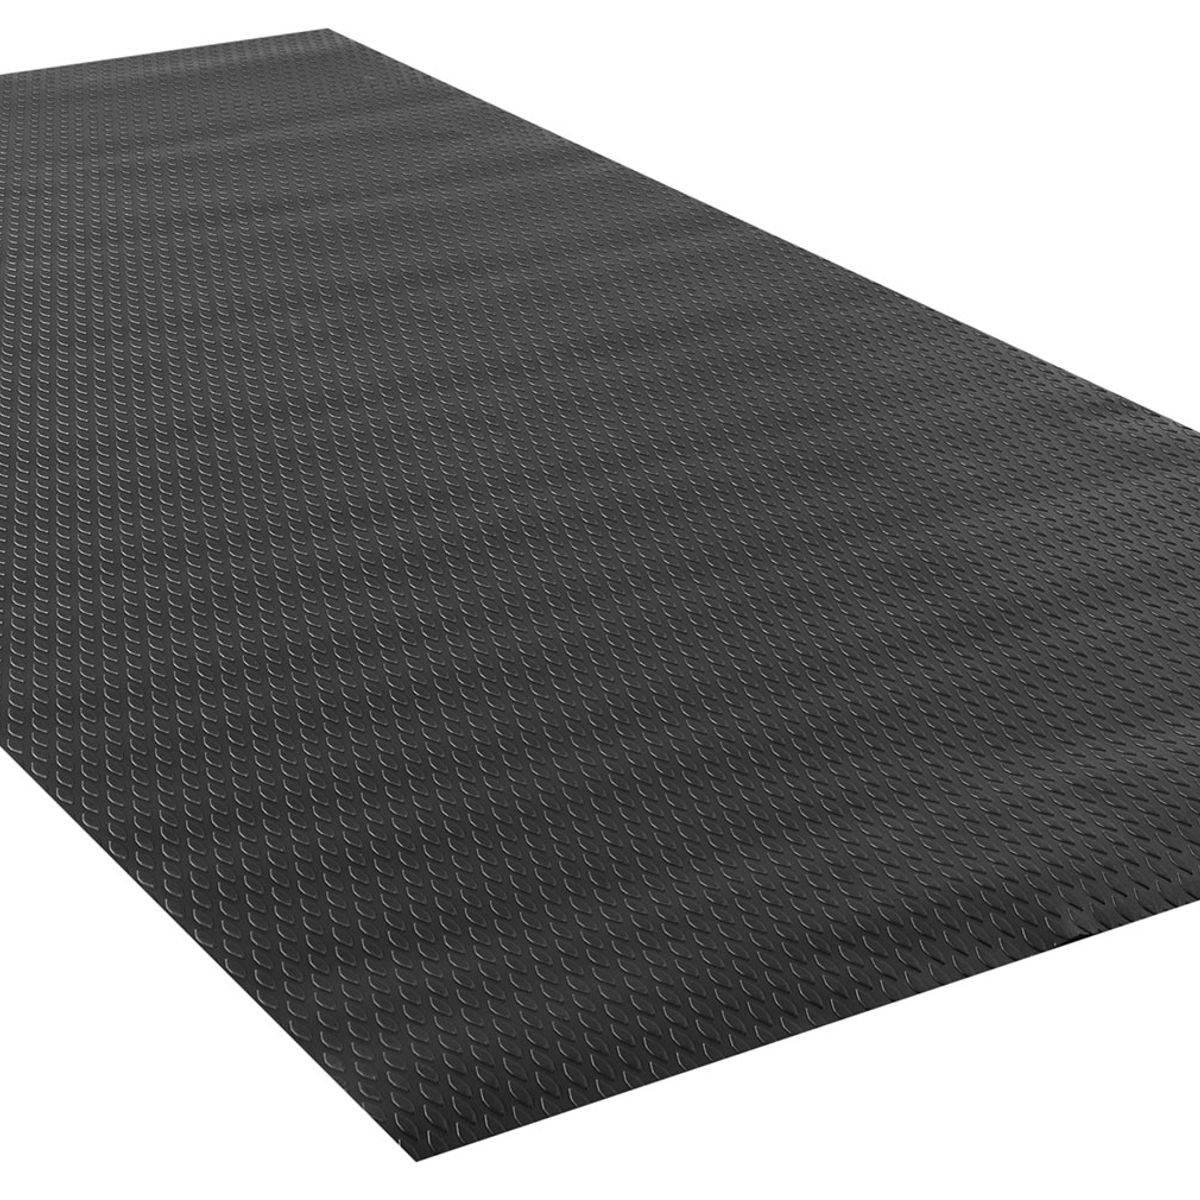 fit carpets unvs ws ford car fm vm heavy floor floorliner mats aerostar duty set waterproof van